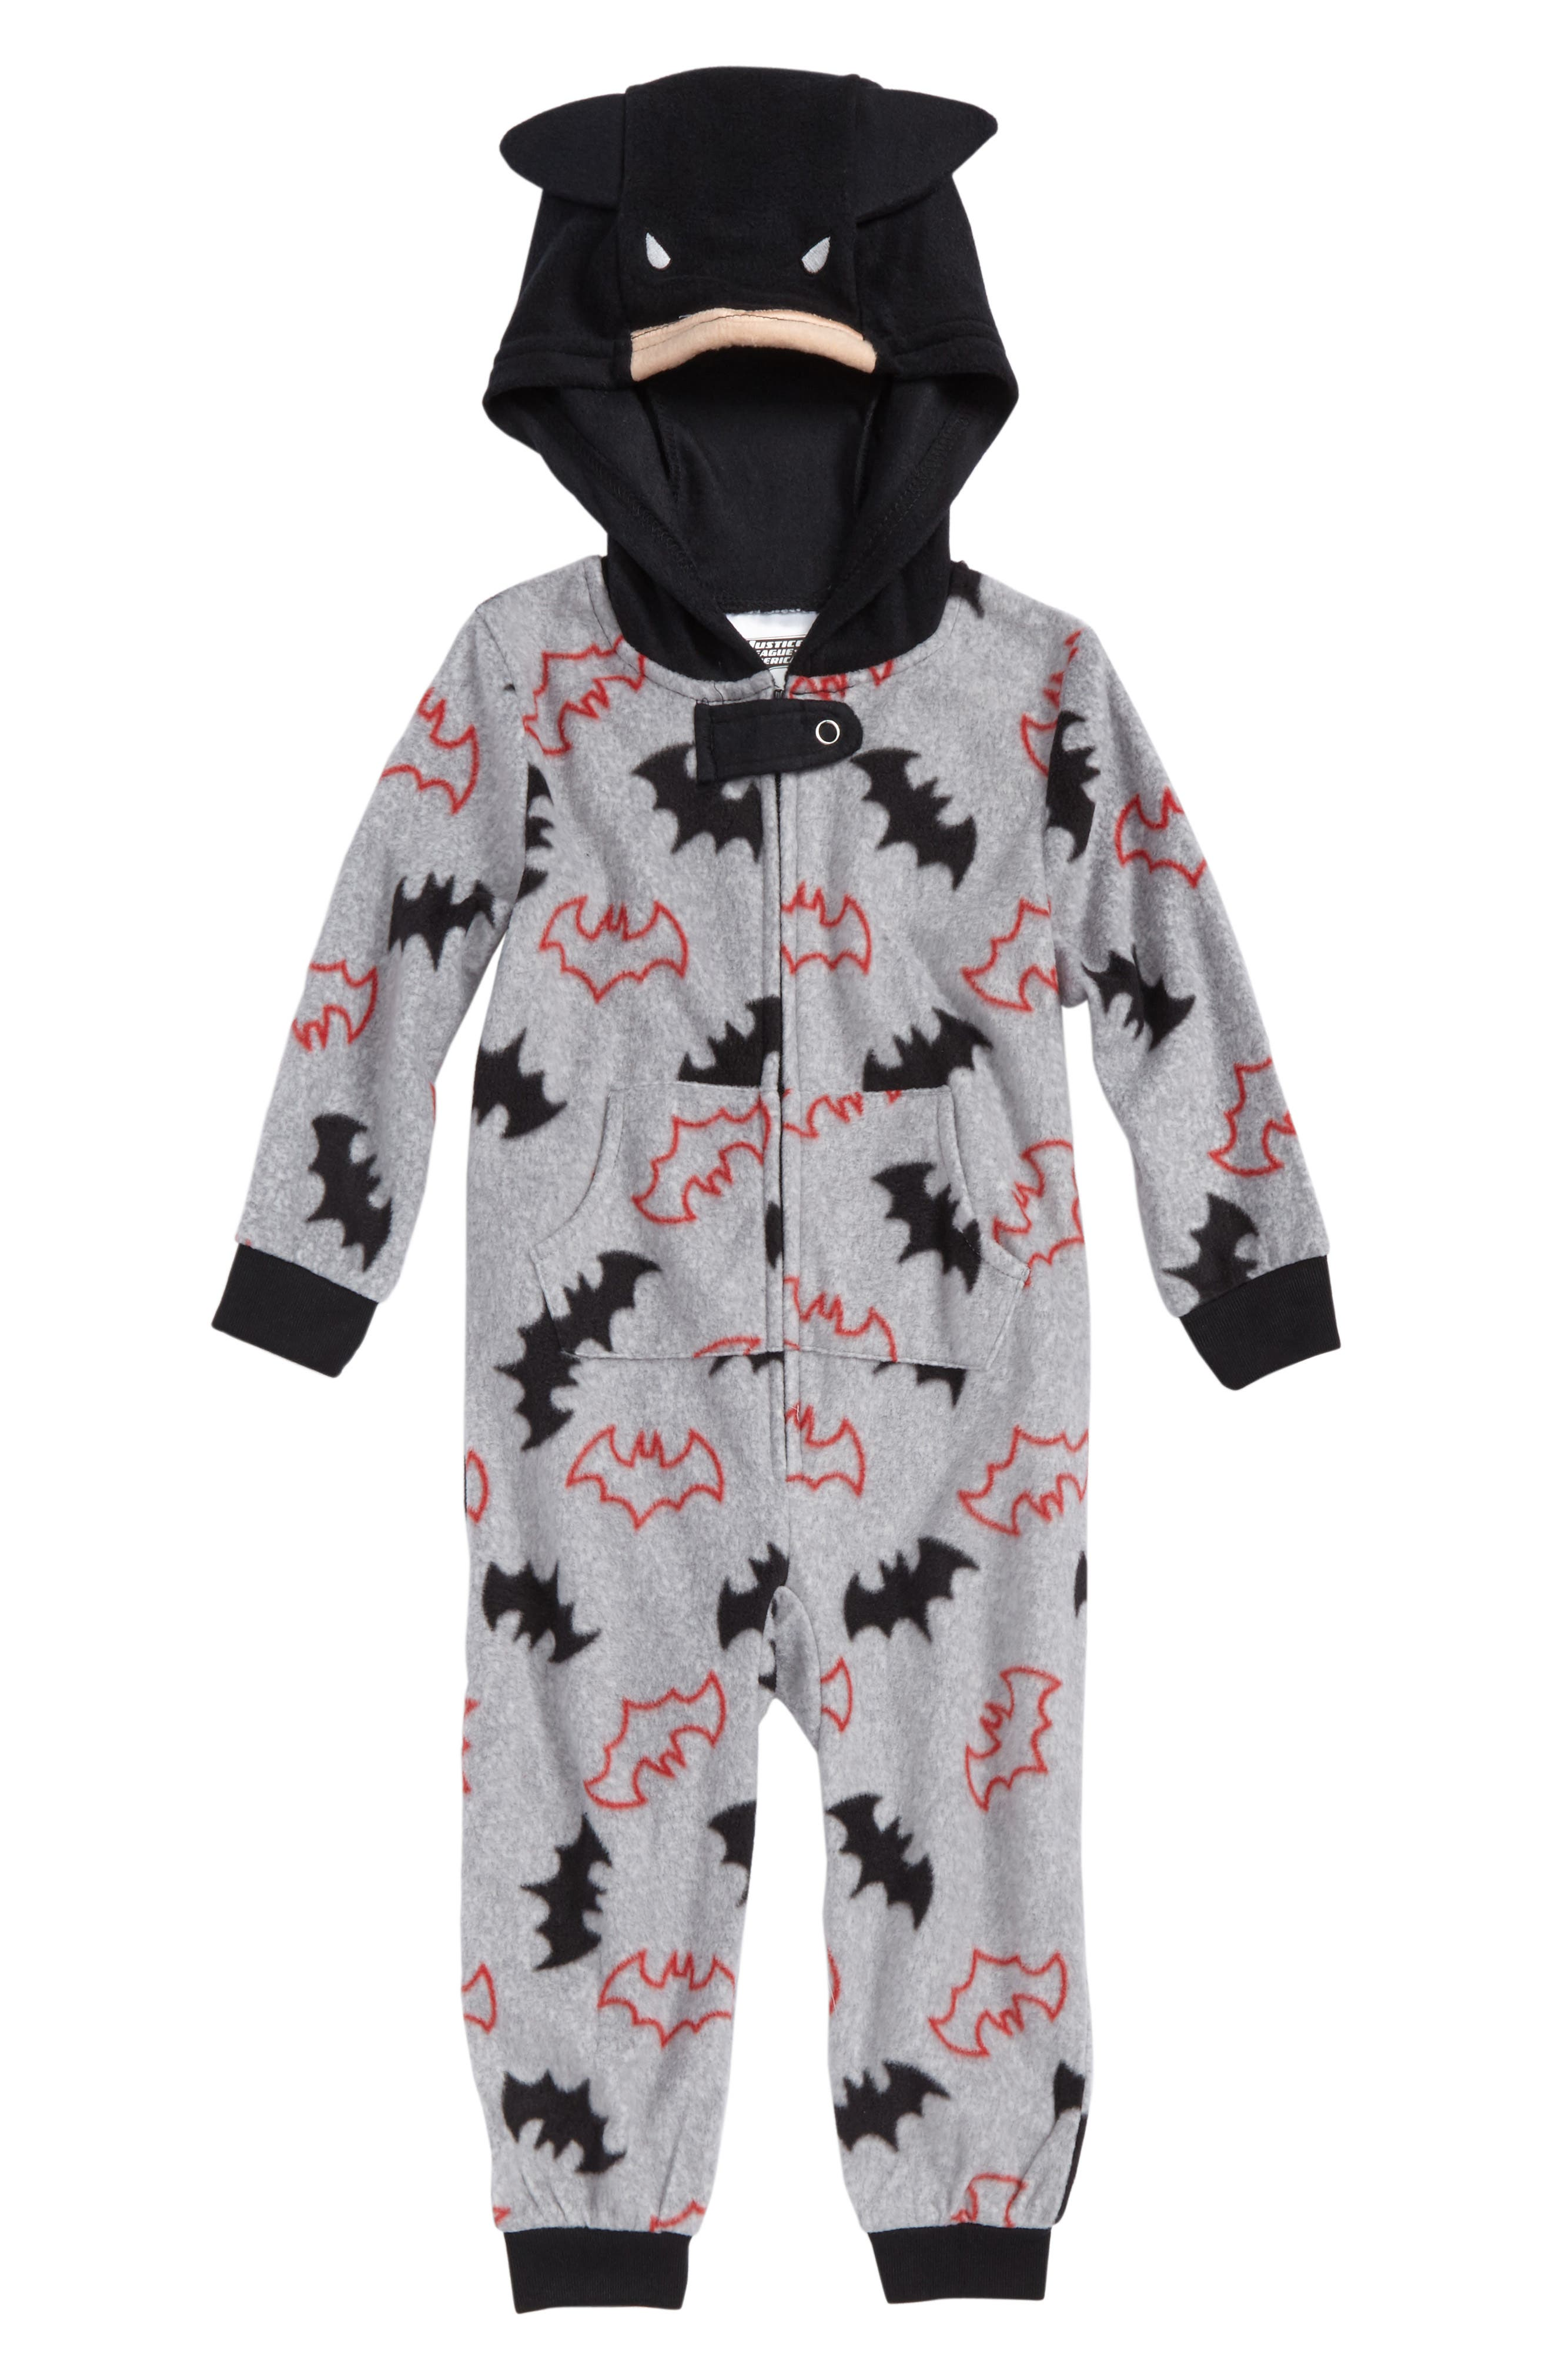 Batman Microfleece One-Piece Pajamas,                         Main,                         color, 068